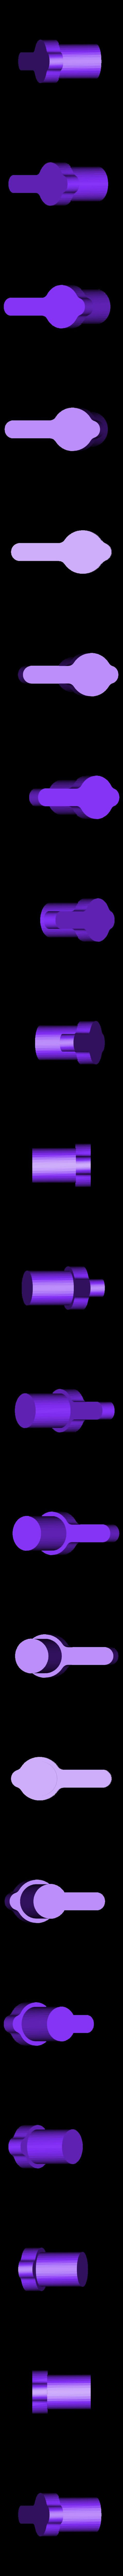 86Duino-Toilet-5.STL Download free STL file 86Duino Toilet • 3D printable object, 86Duino